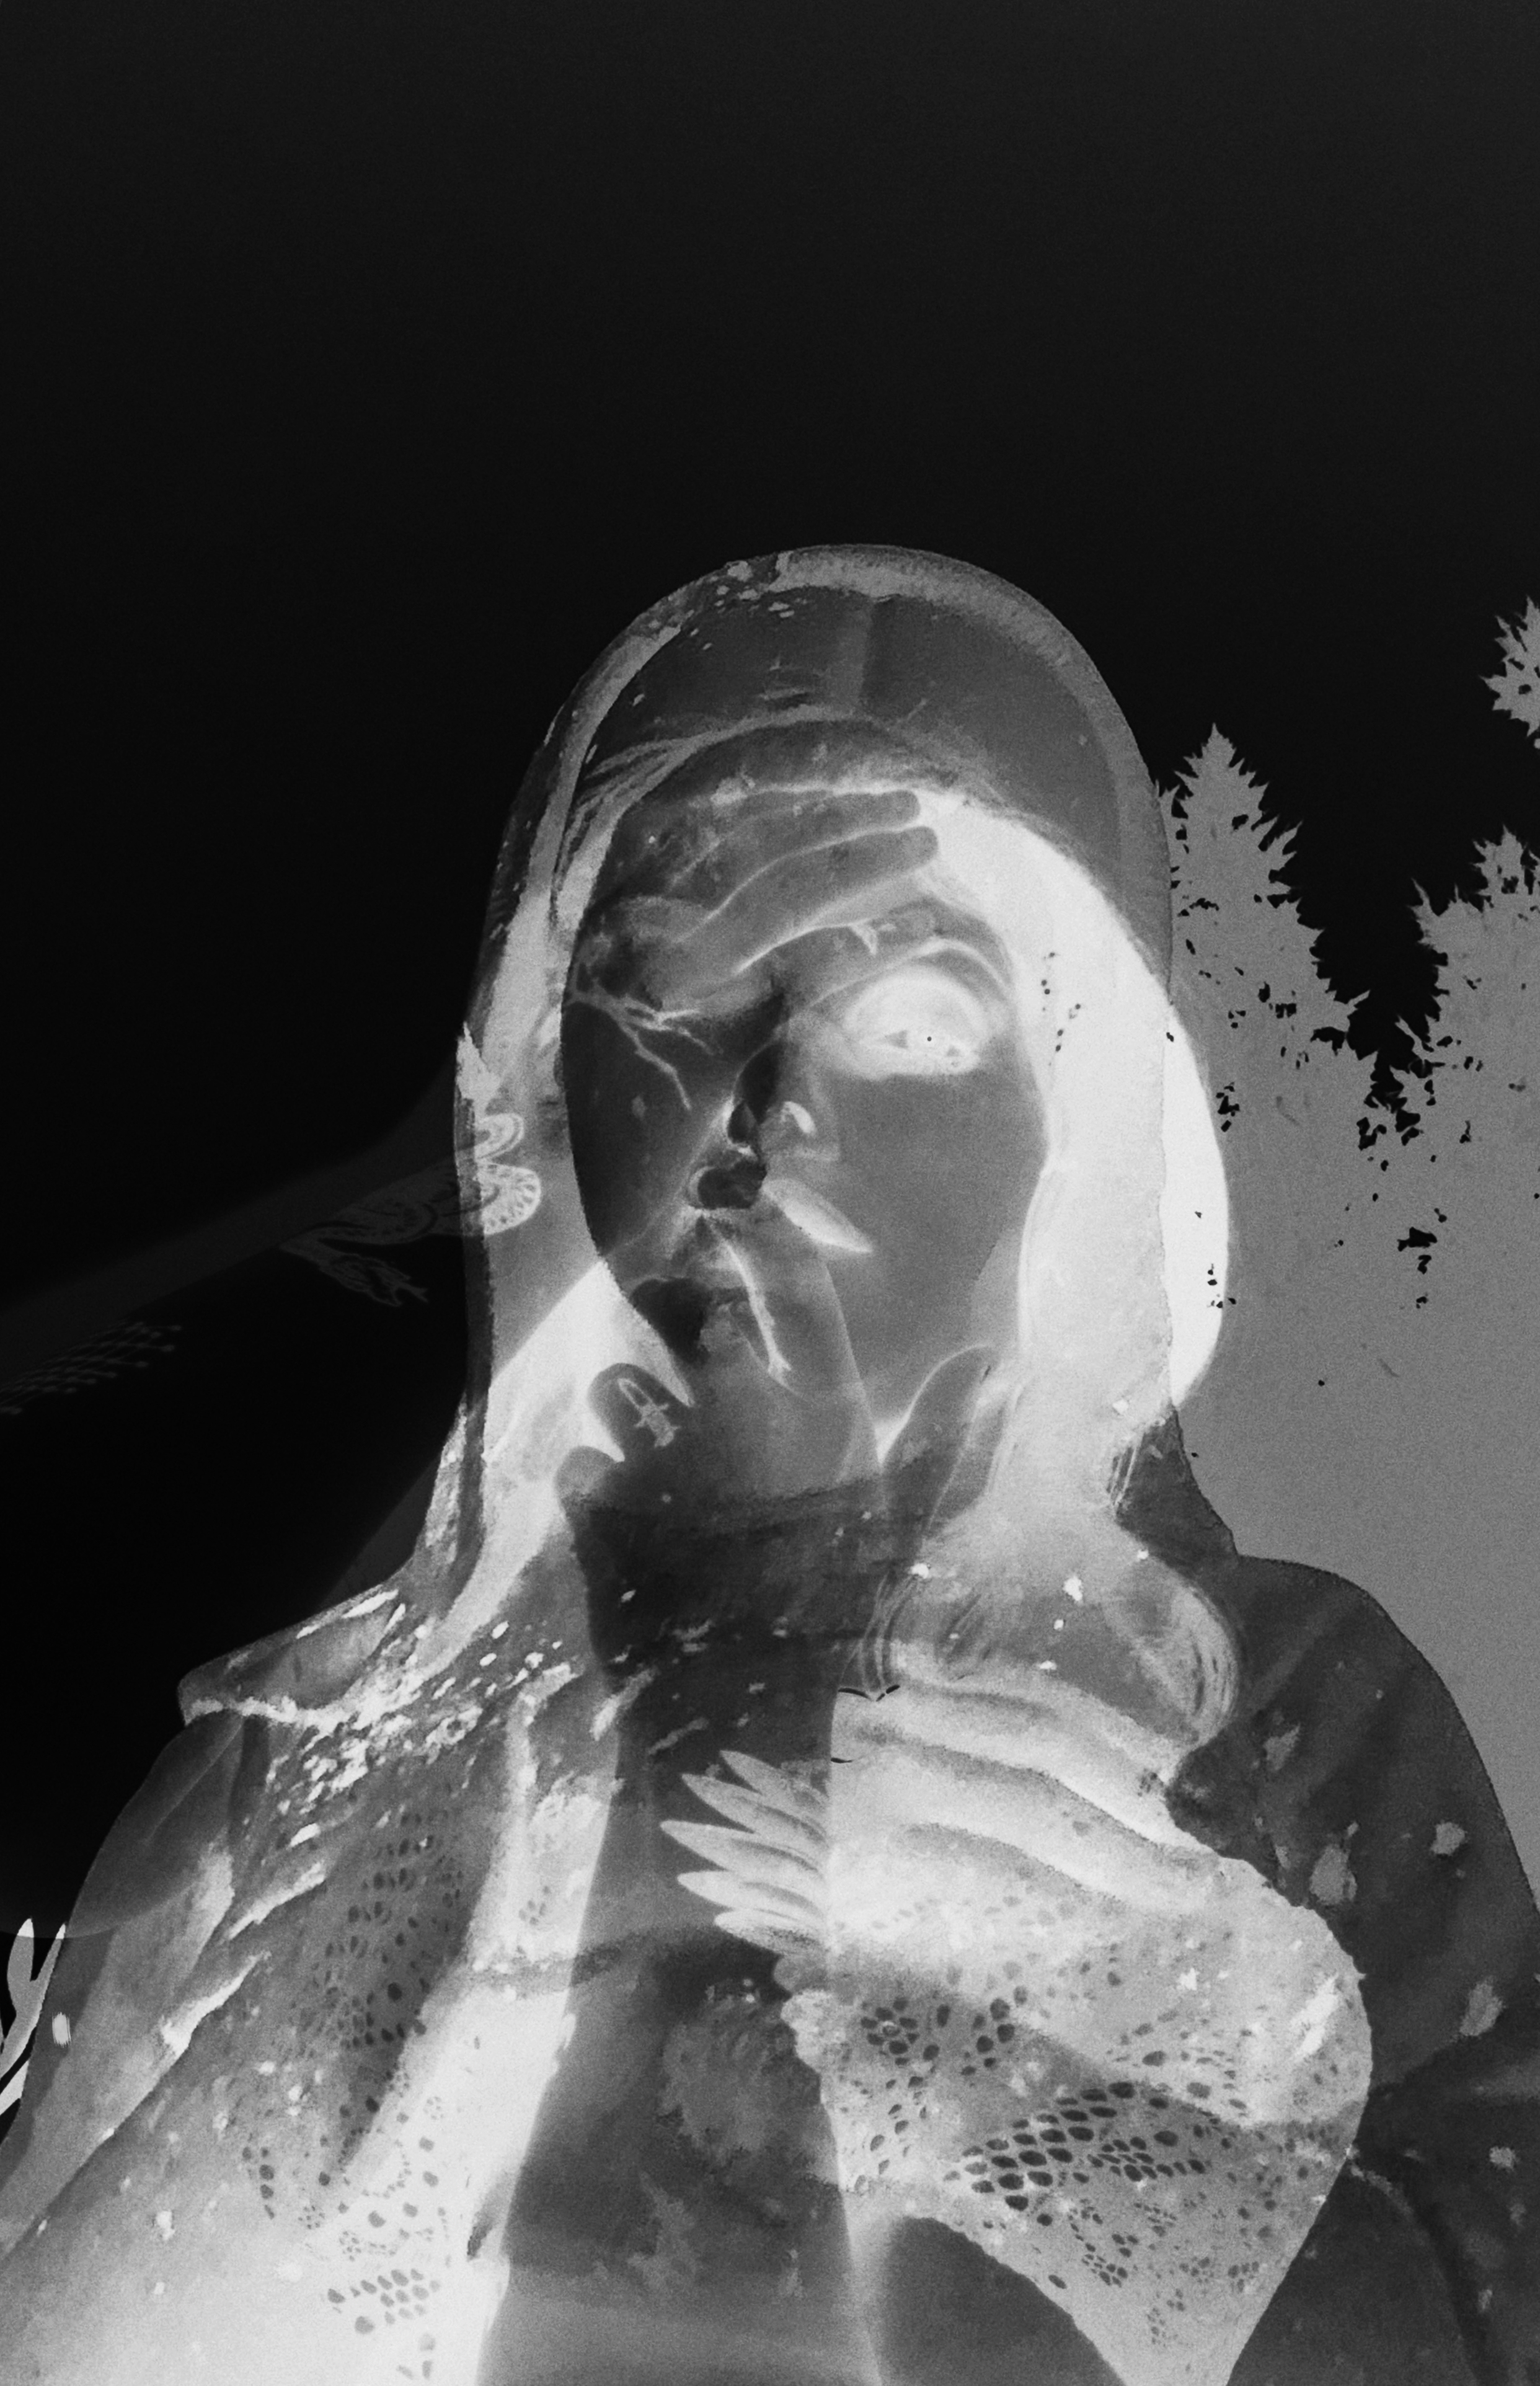 Chelsea Wolfe by Sven Harambasic